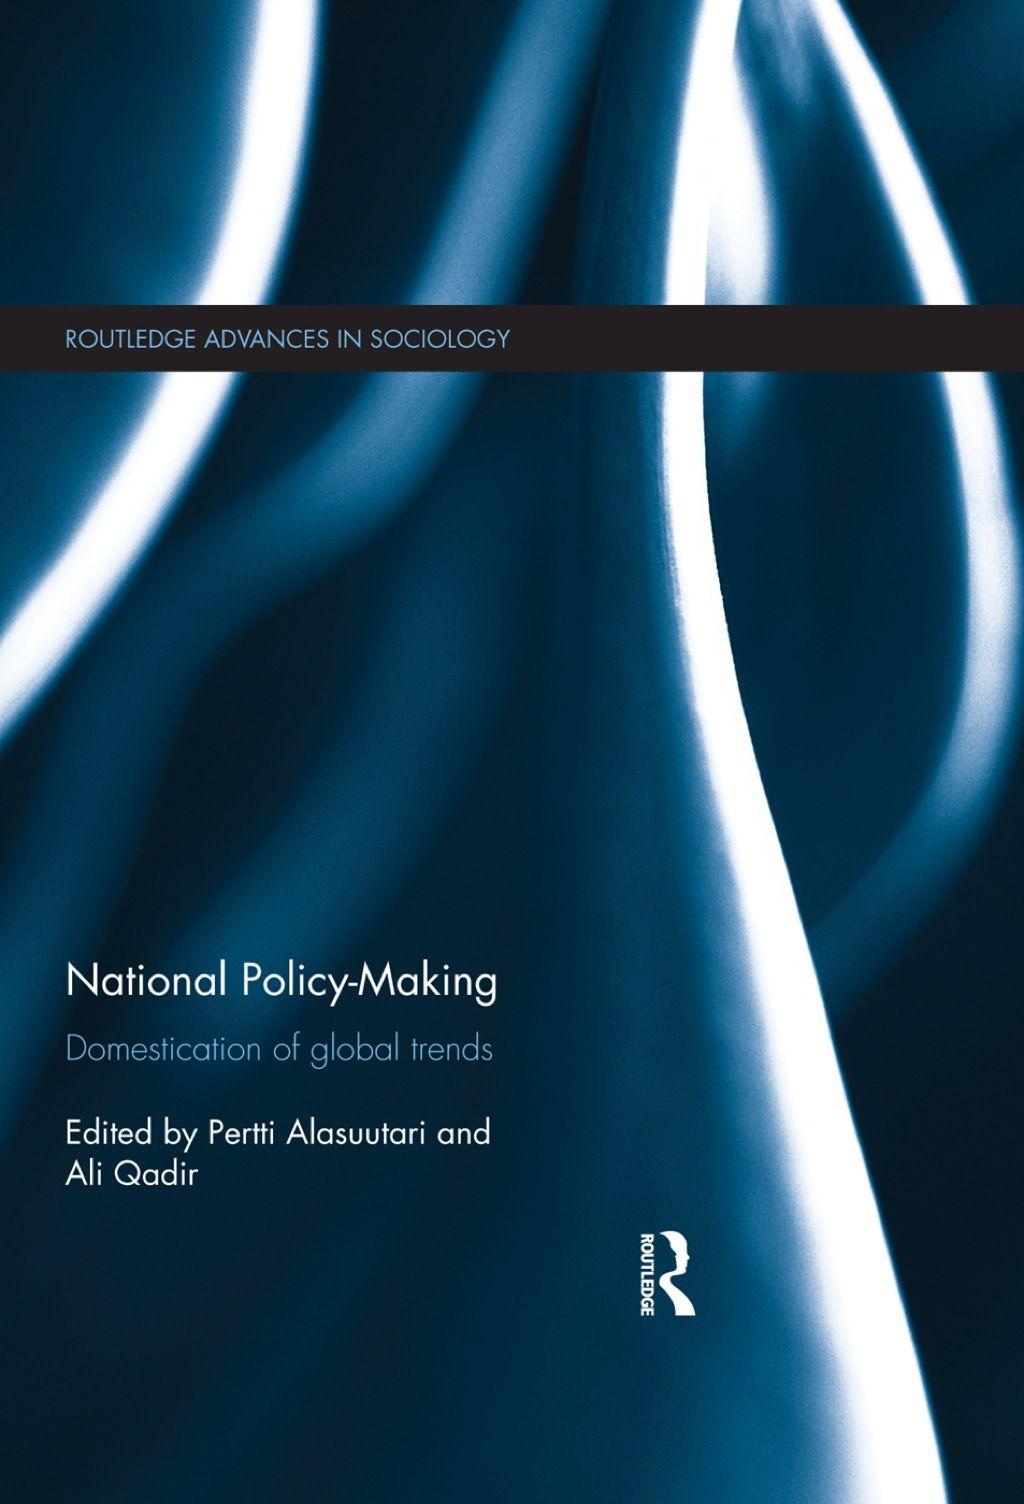 National Policy Making Ebook Rental In 2019 Ebooks Books